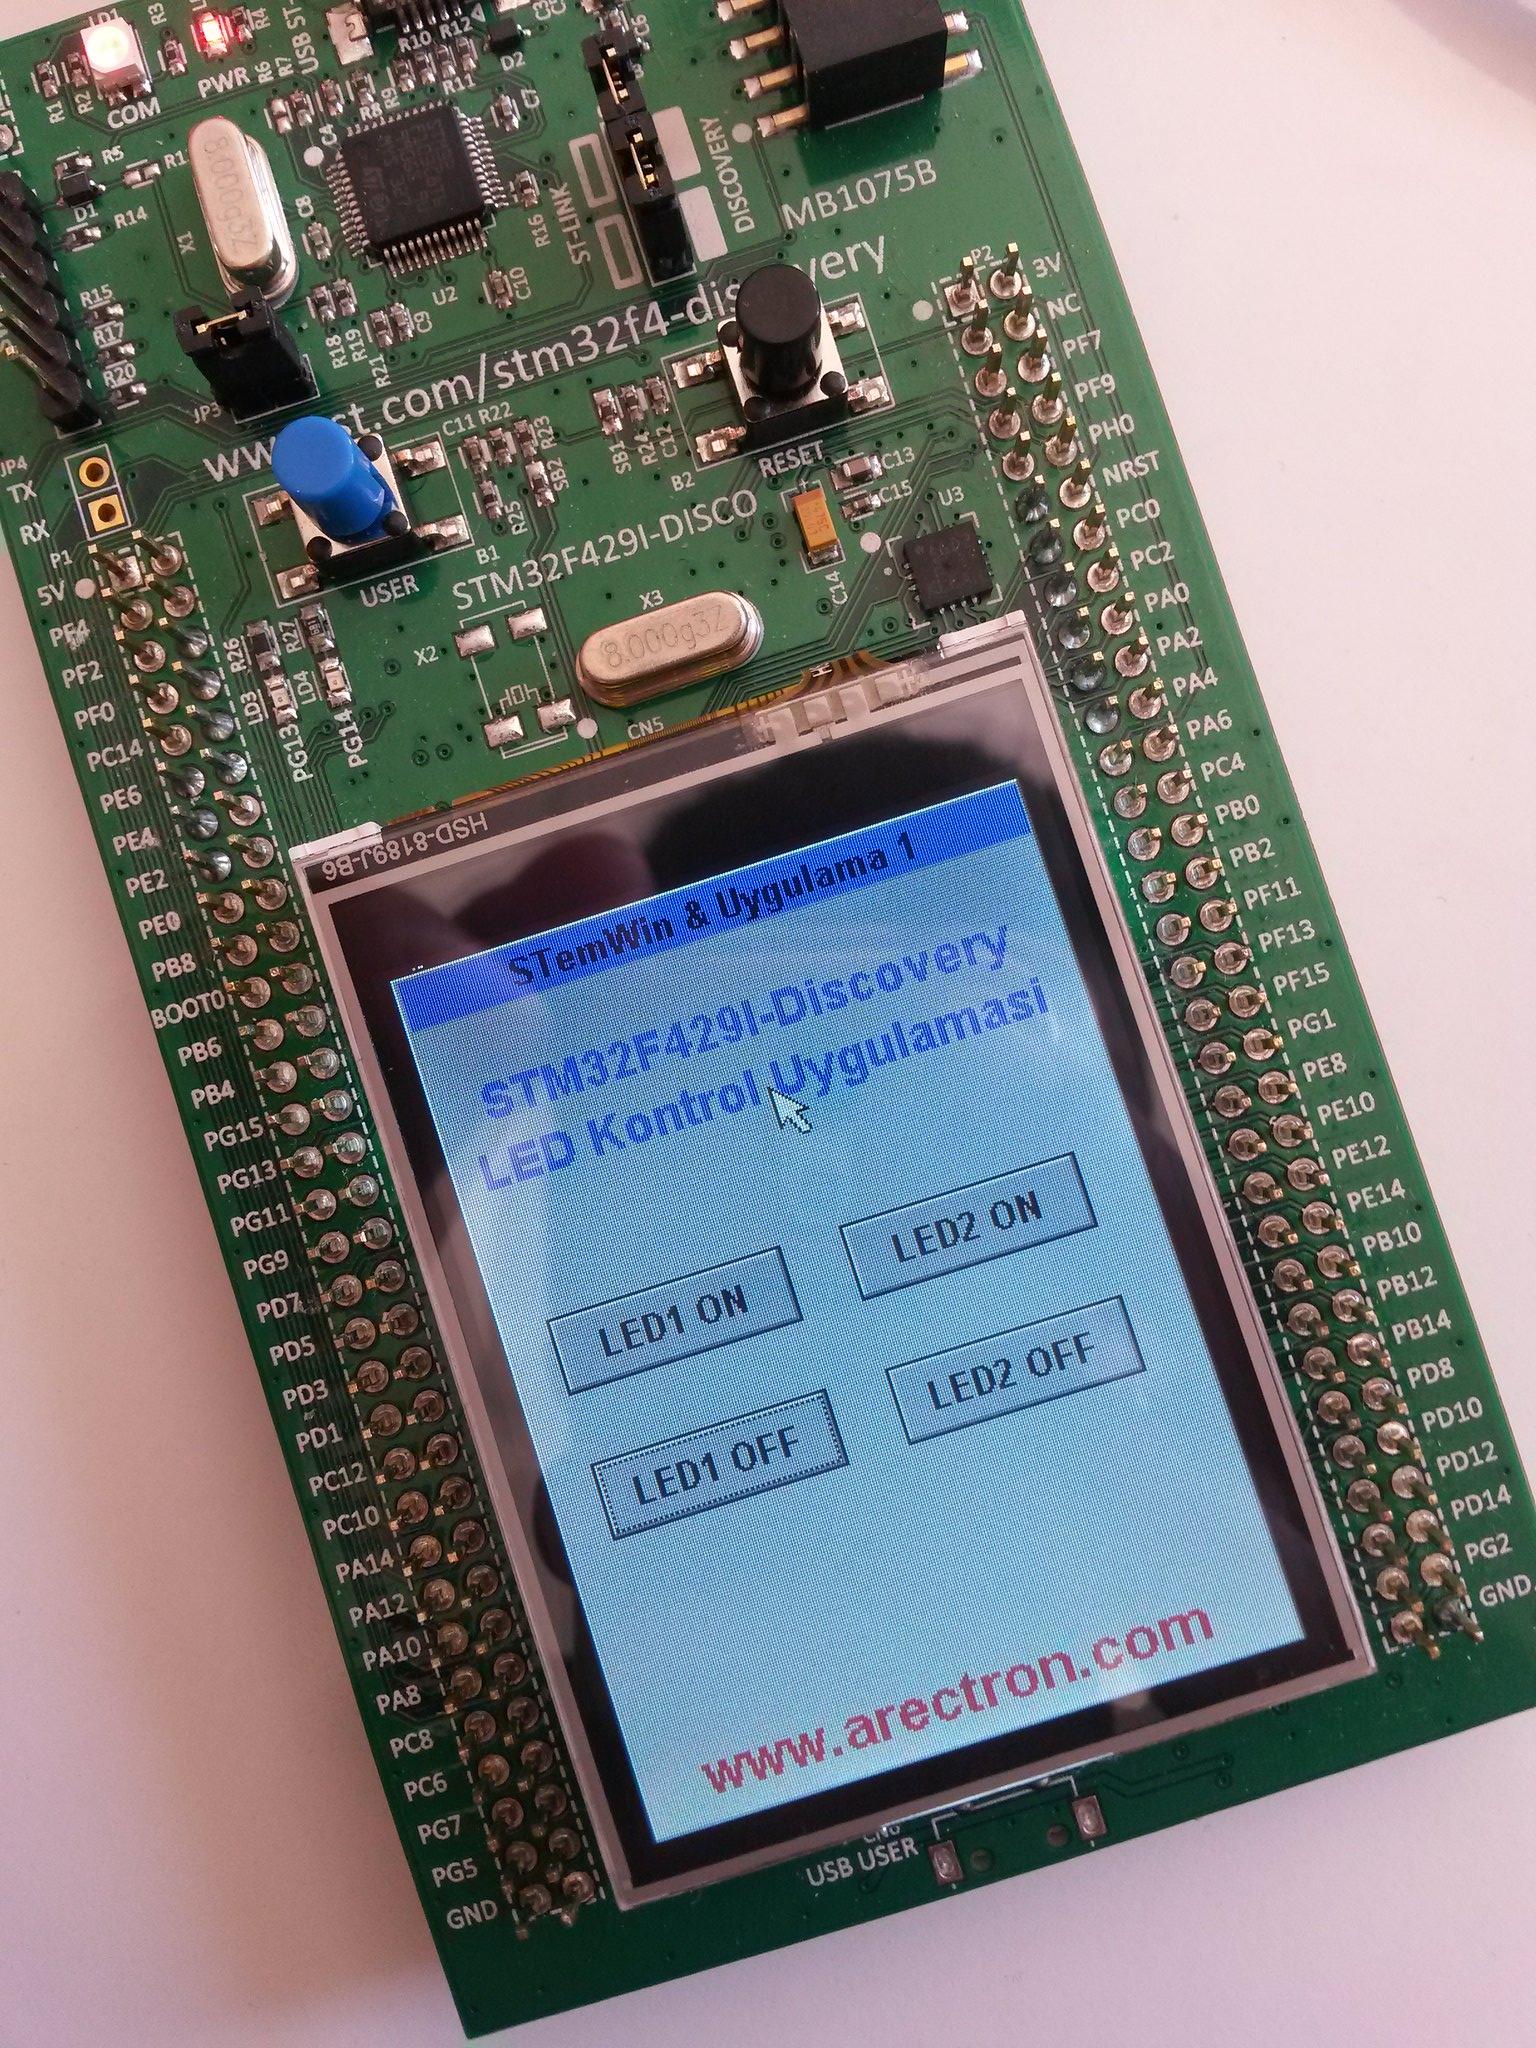 STM32F429I Discovery'de Keil ile STemWin kurulumu